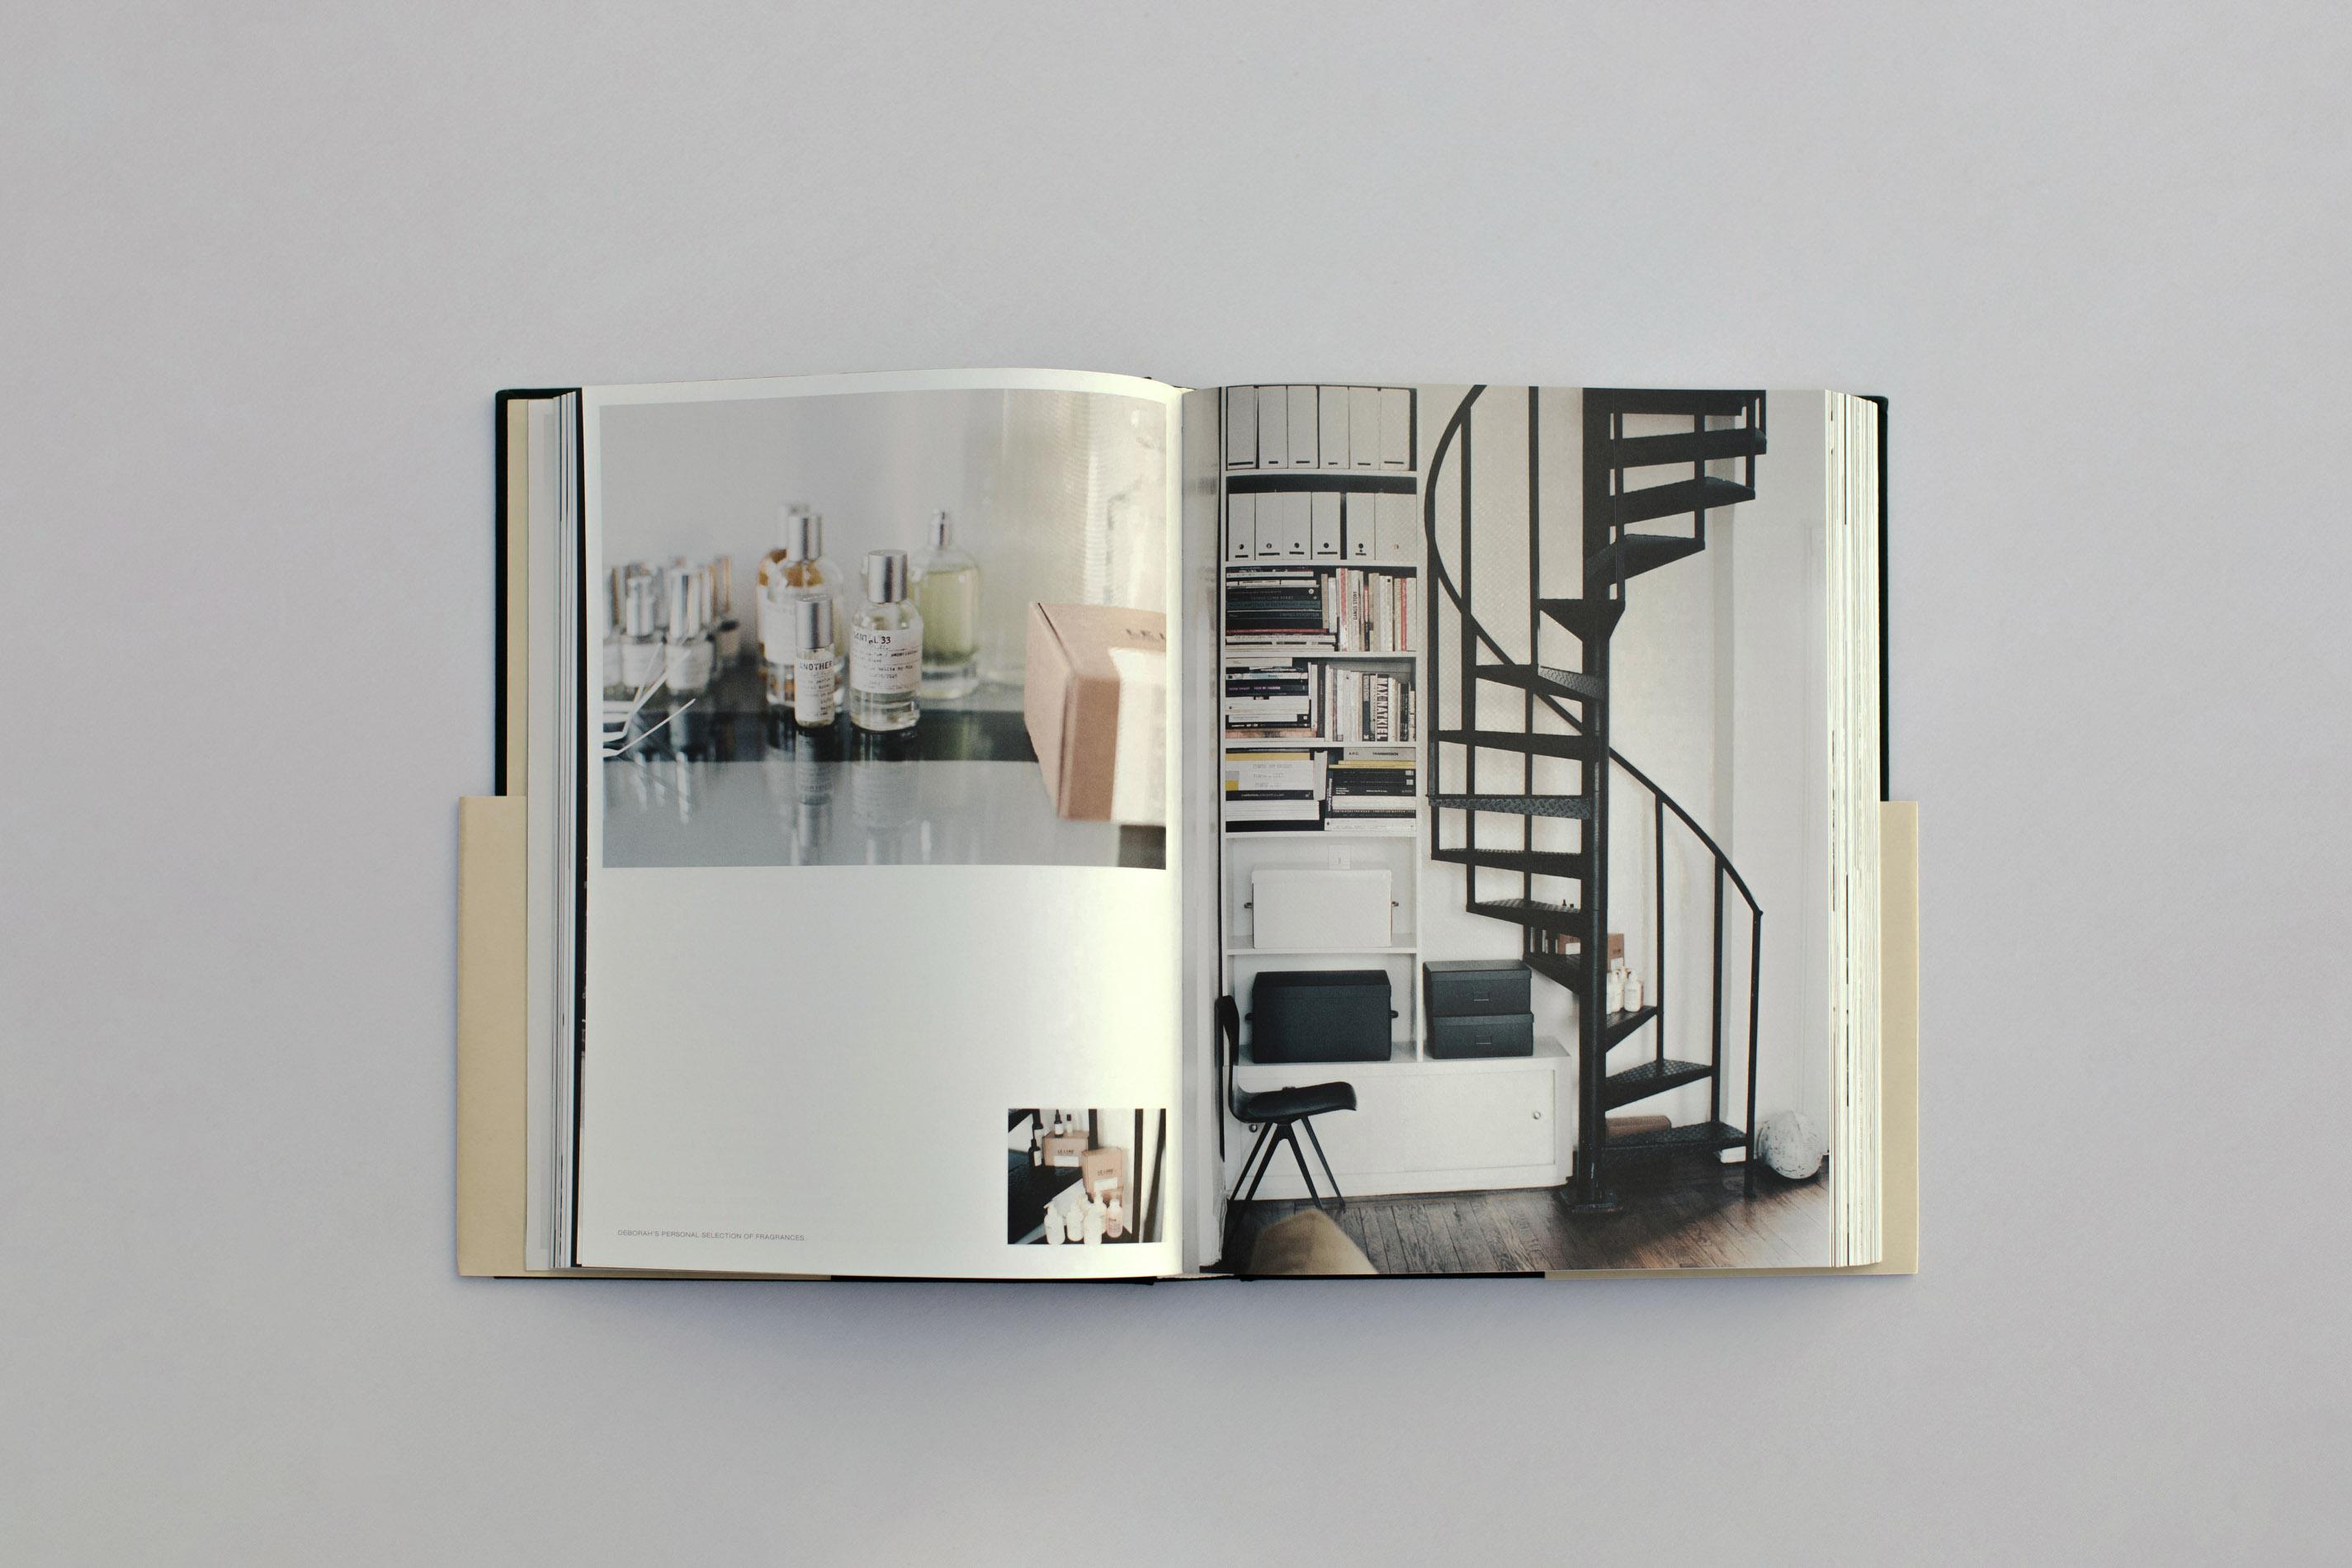 Faculty Department Volume Two, Faculty Department, Justin Chung, Book, Kodak, Le Labo Fragrances, Brooklyn, NY, Deborah Royer